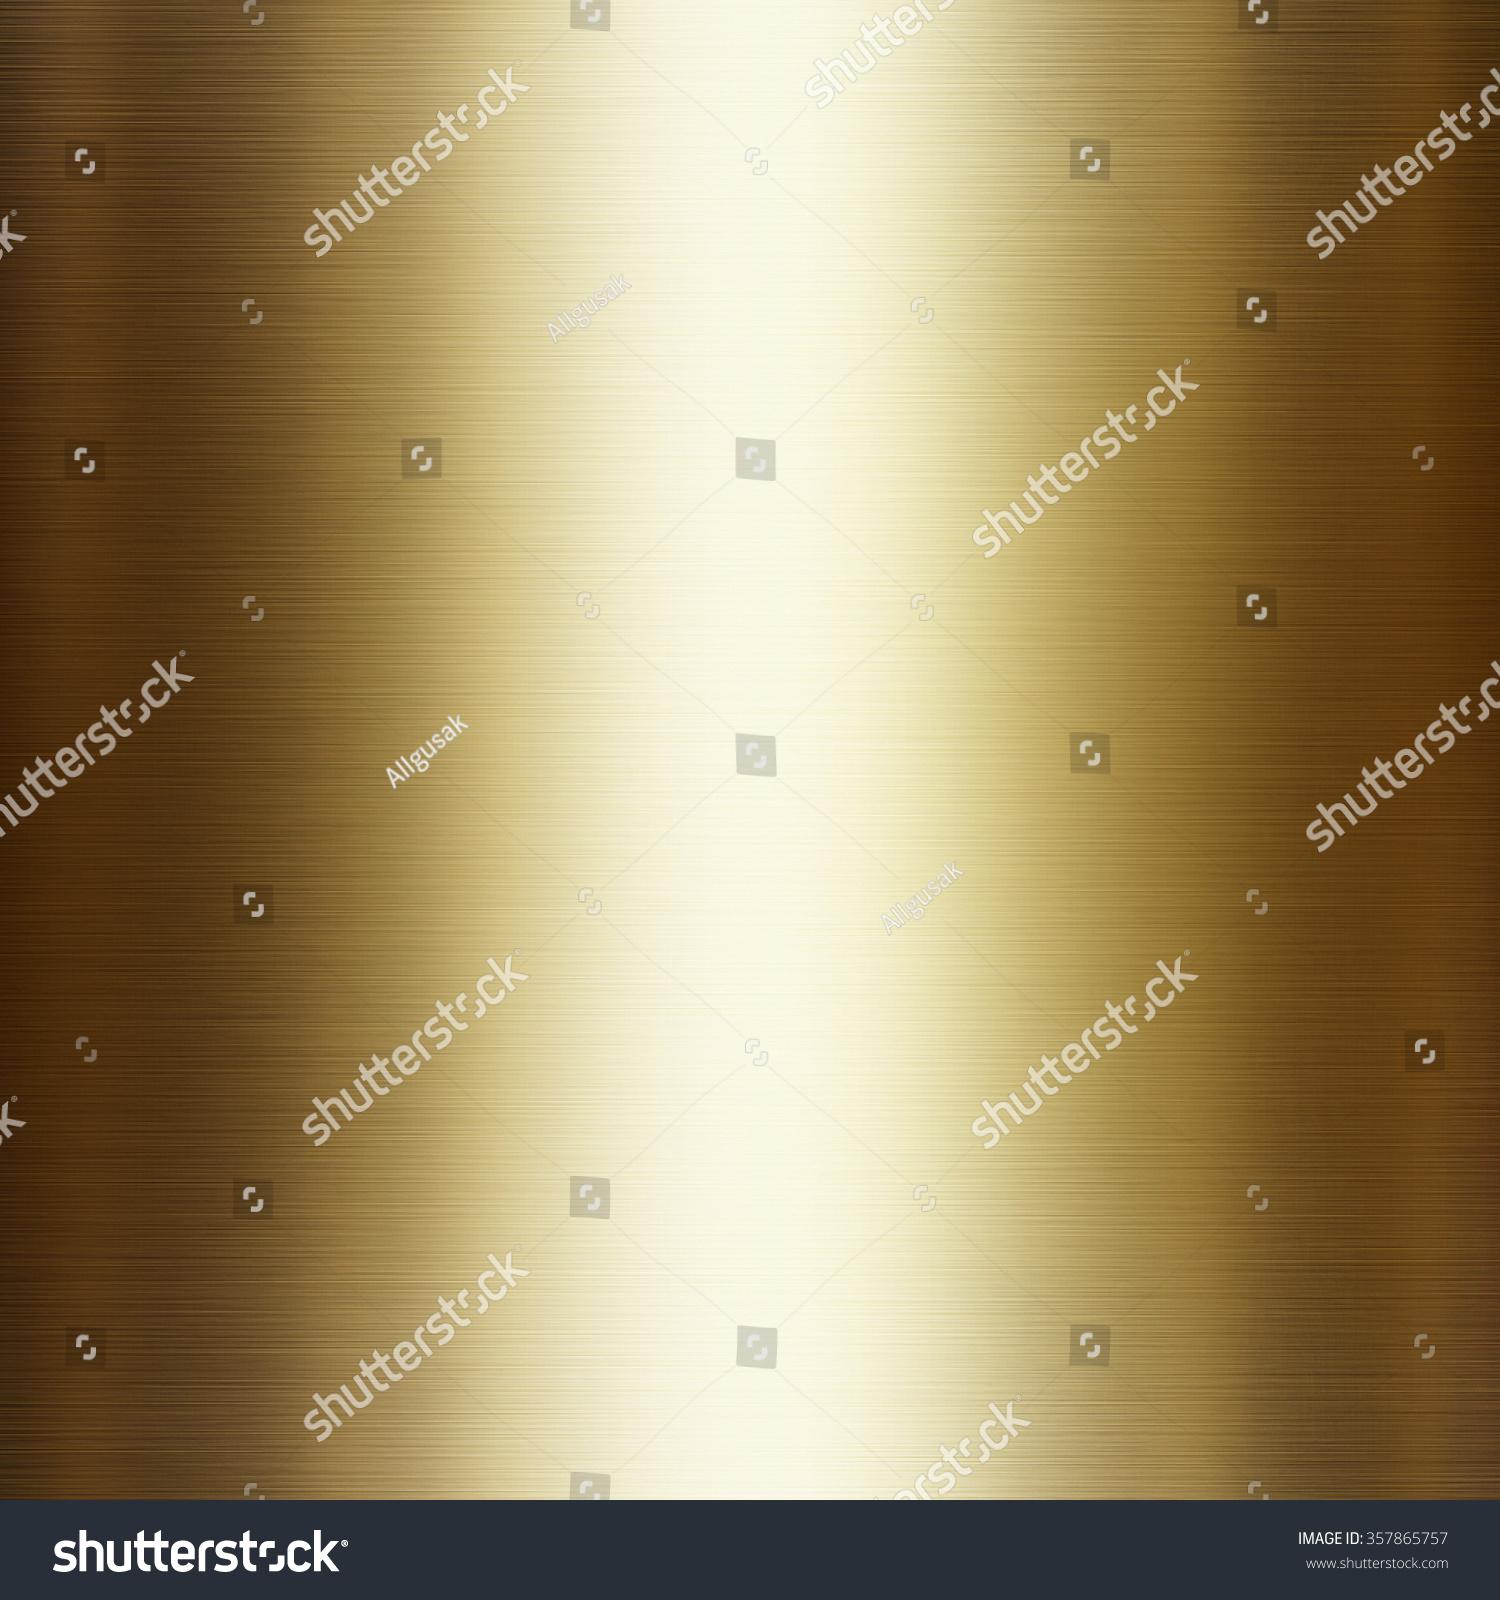 gold metal texture   EZ Canvas